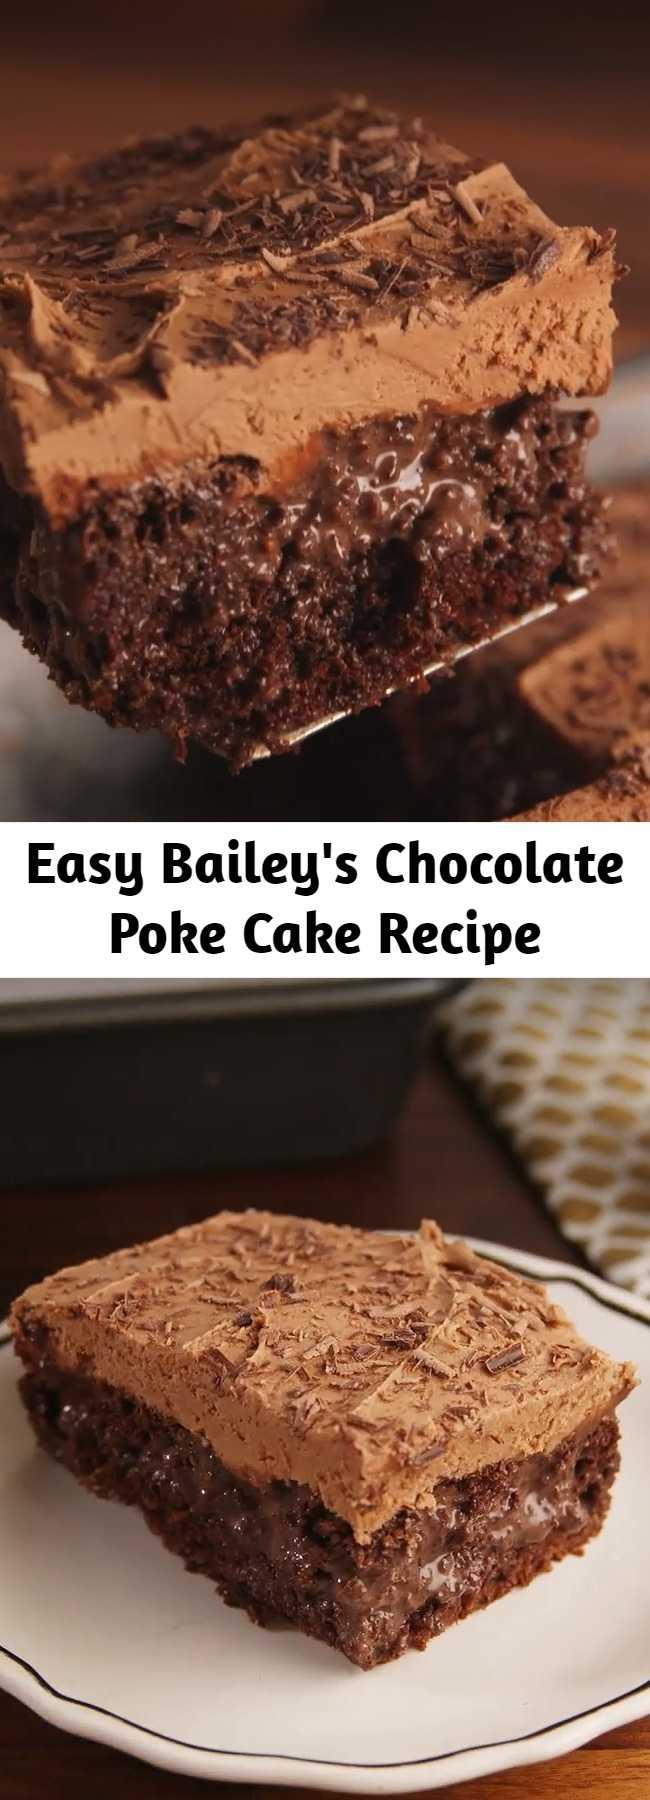 Easy Bailey's Chocolate Poke Cake Recipe - Chocolate on chocolate. Step up your boxed chocolate cake mix with Baileys! If you love Baileys you'll love this Baileys Poke Cake. #easy #recipe #cake #chocolate #baileys #liqueur #alcohol #pokecake #heavycream #storebought #condensedmilk #irishcream #irish #howtomake